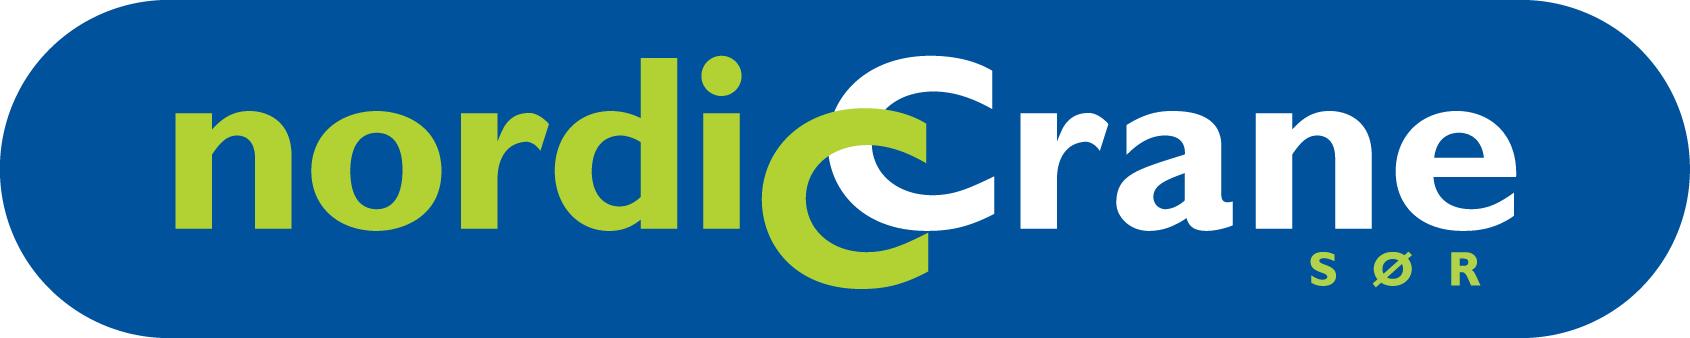 NordicCrane Sør logo